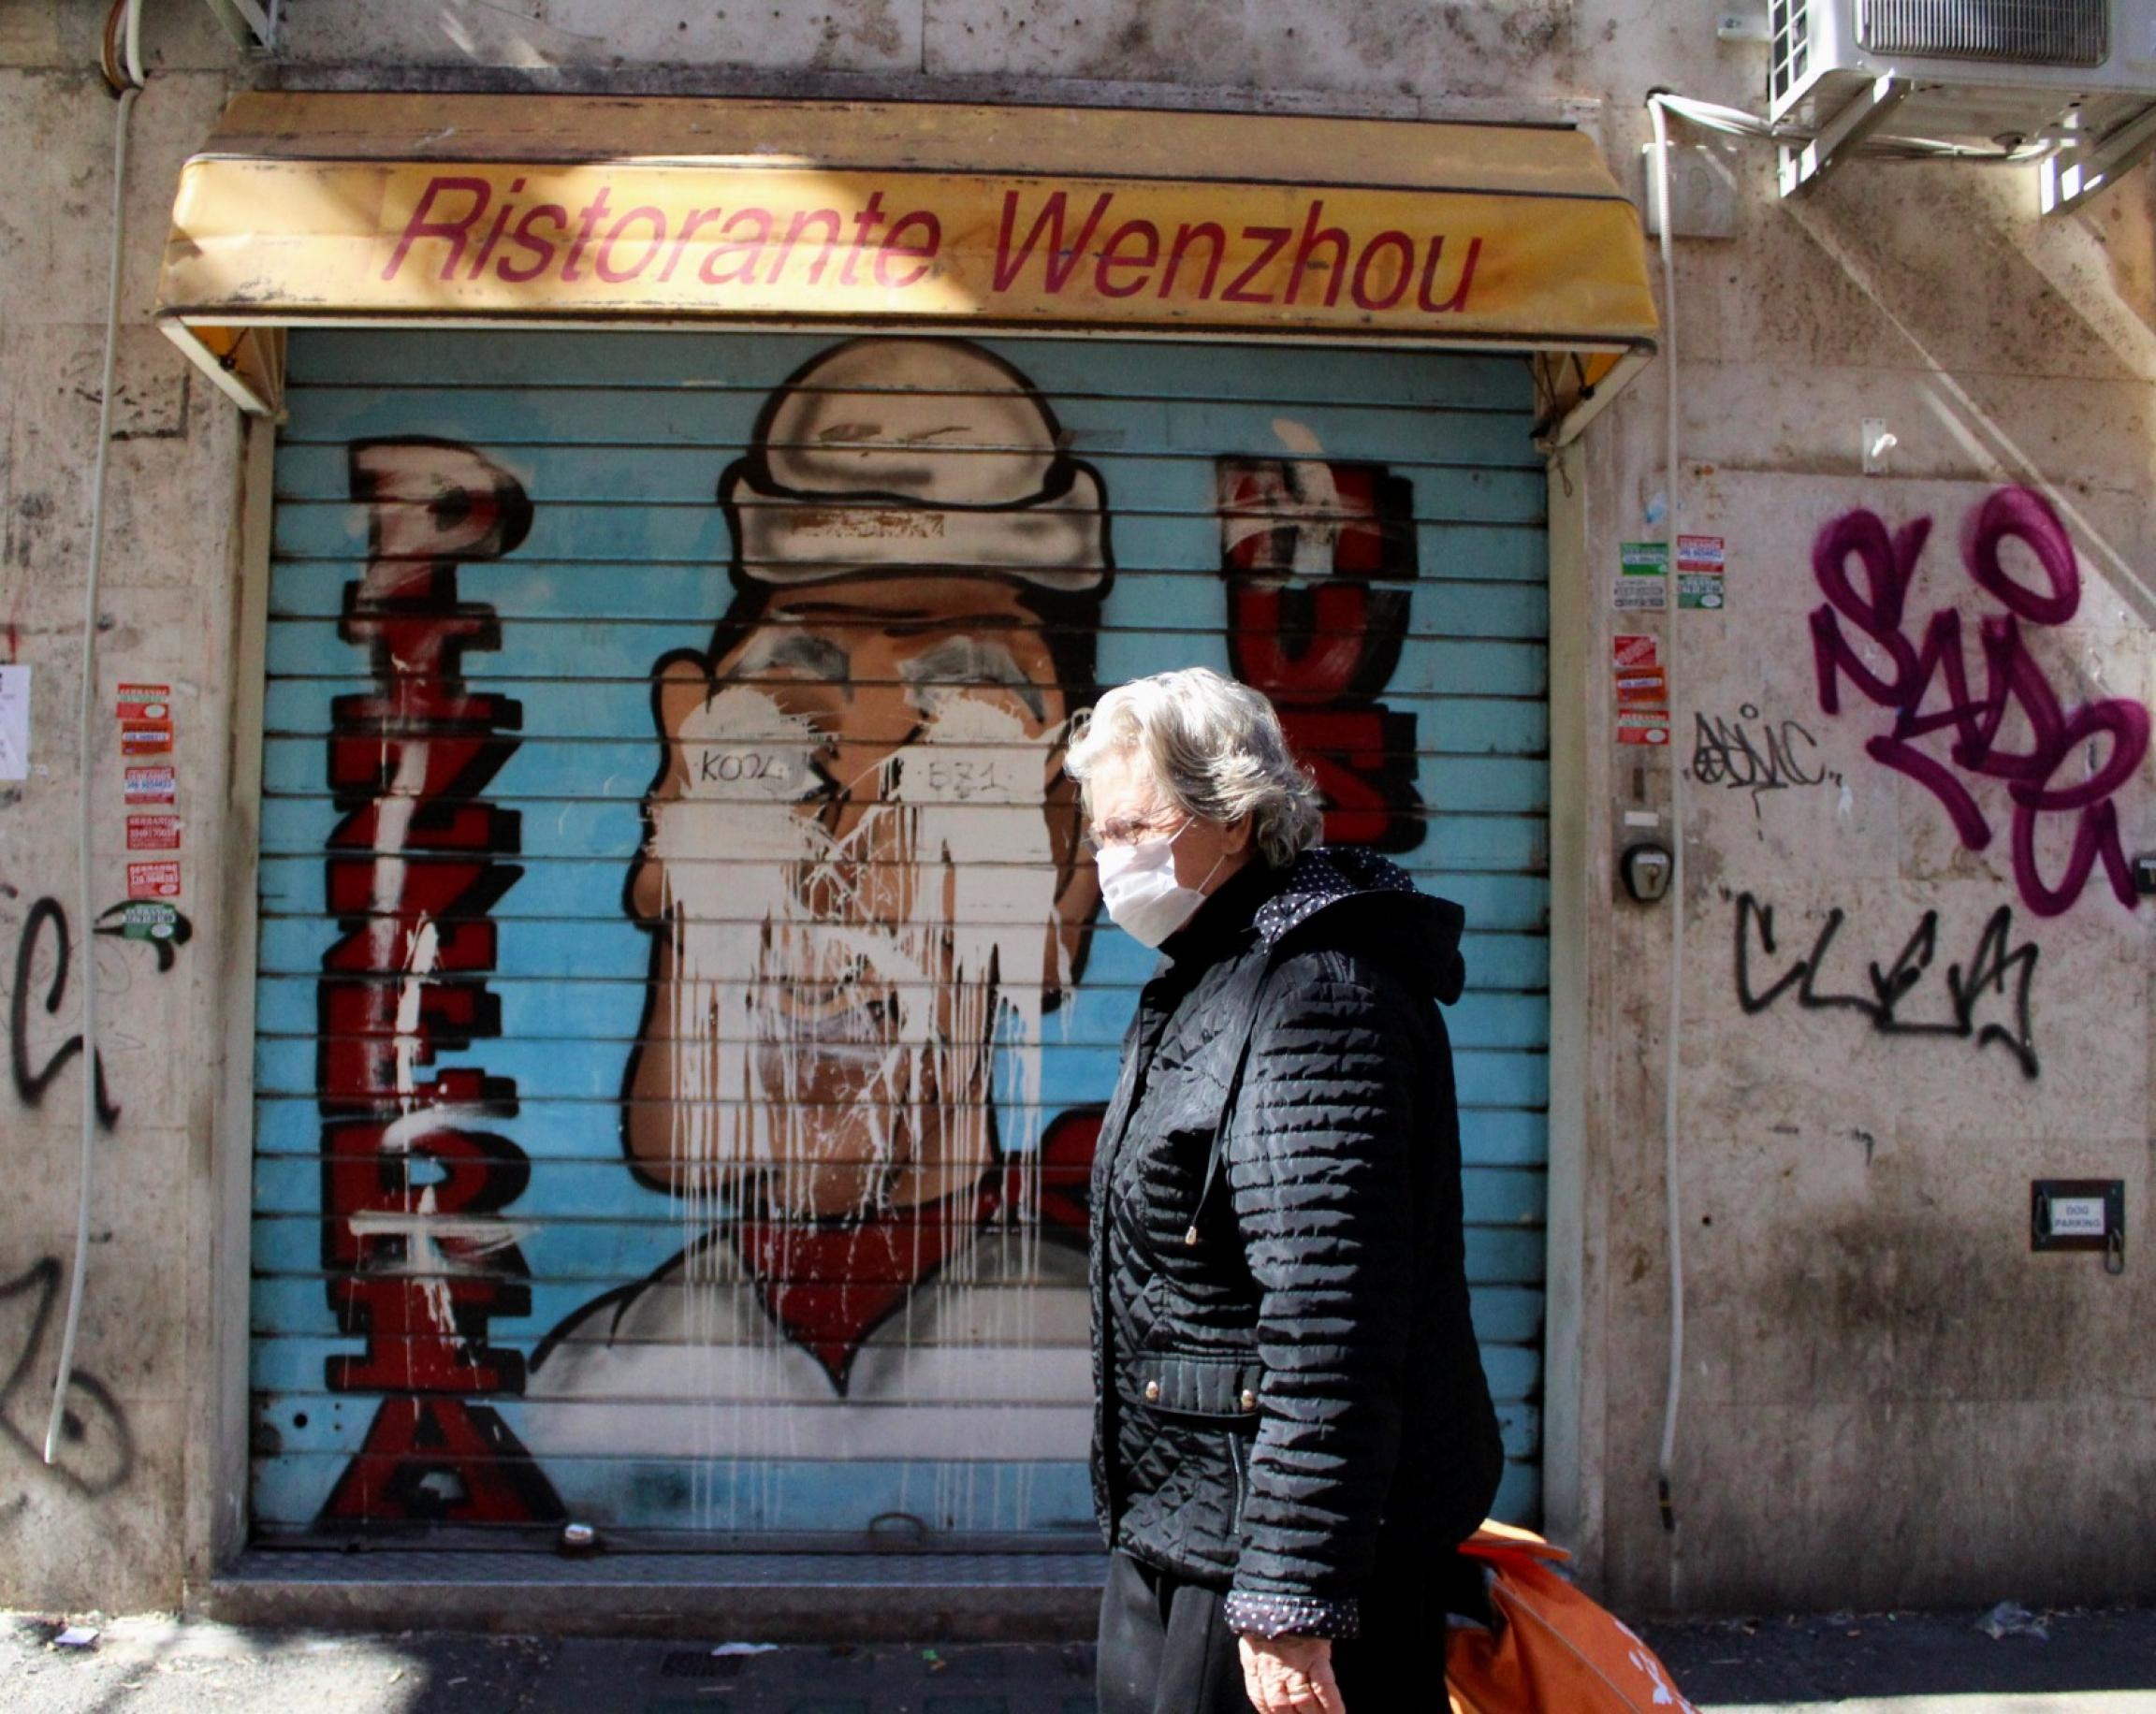 A woman wearing a mask walks by a popular Chinese restaurant inTorpignattara, Italy.